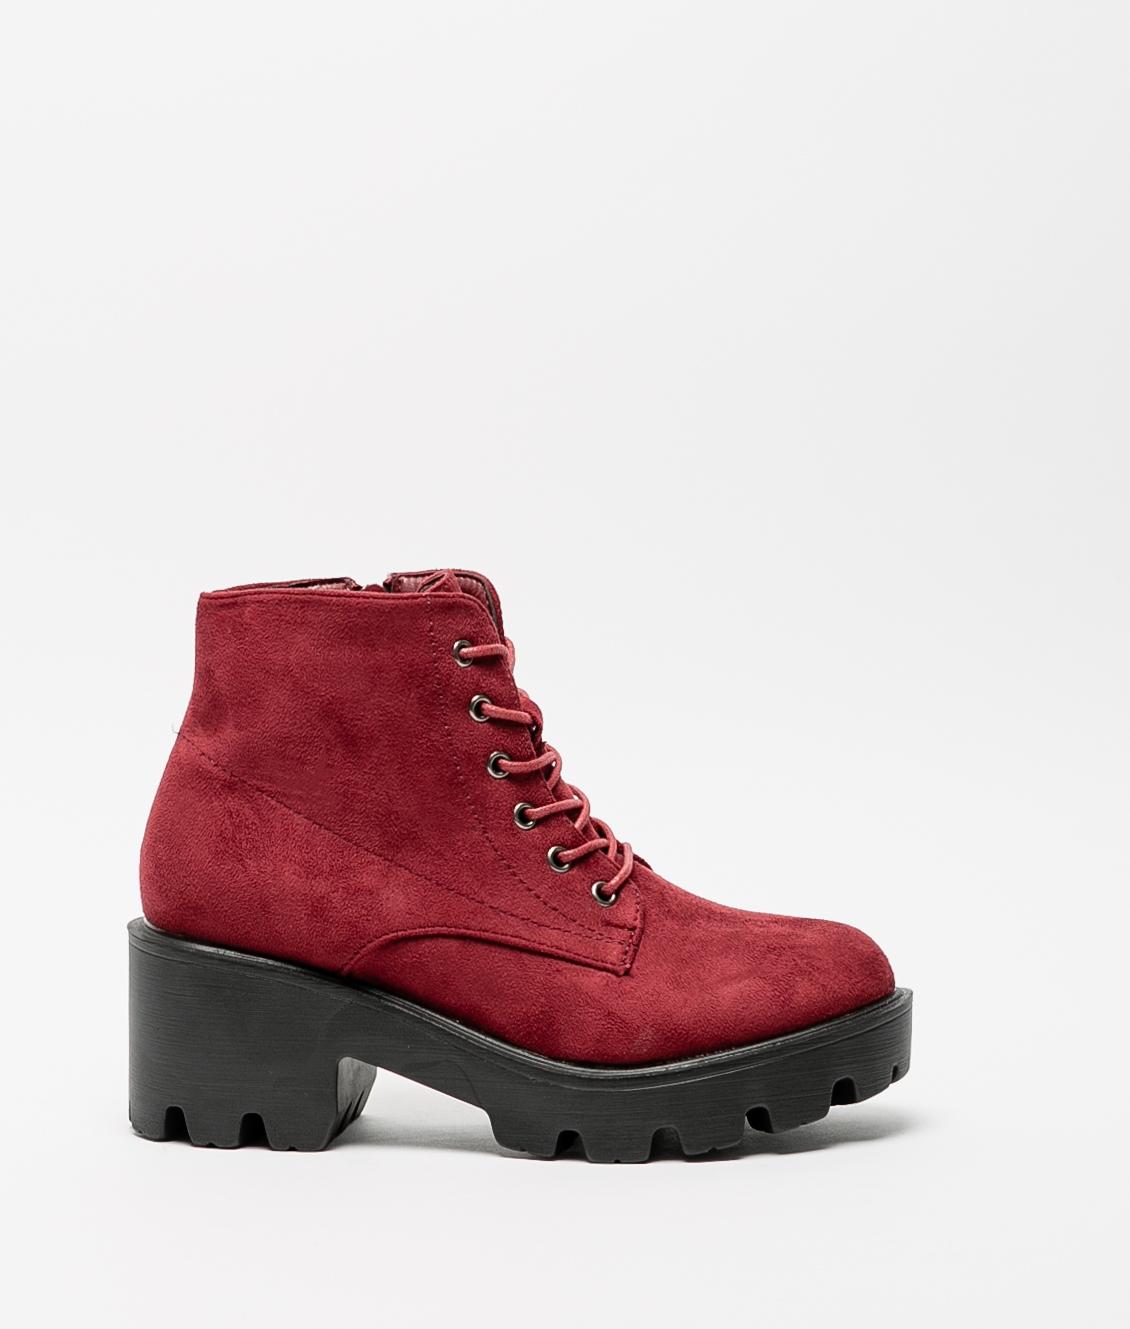 Boot Petite Sely - Grenat